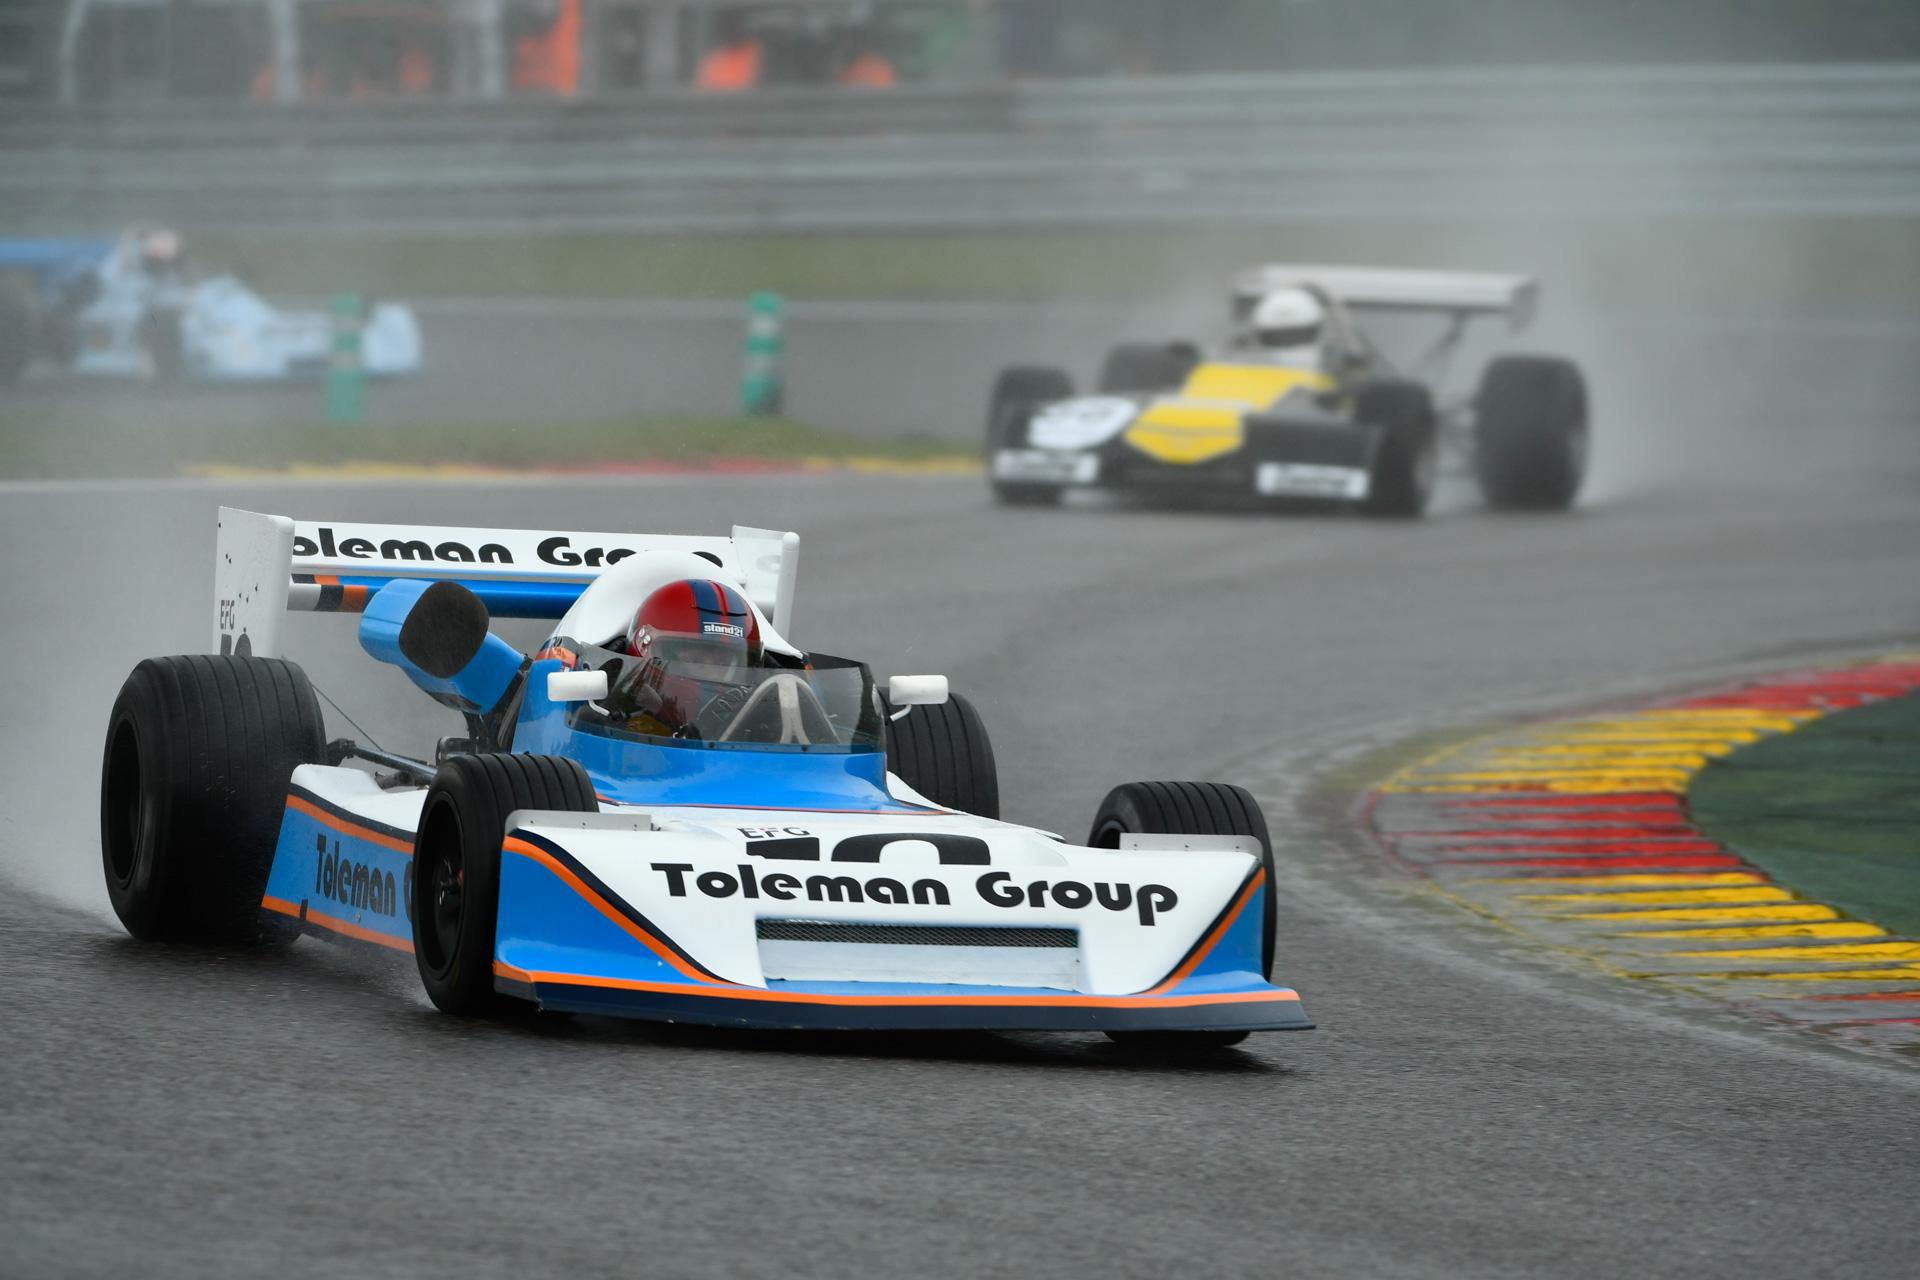 Monza Historic formula 2